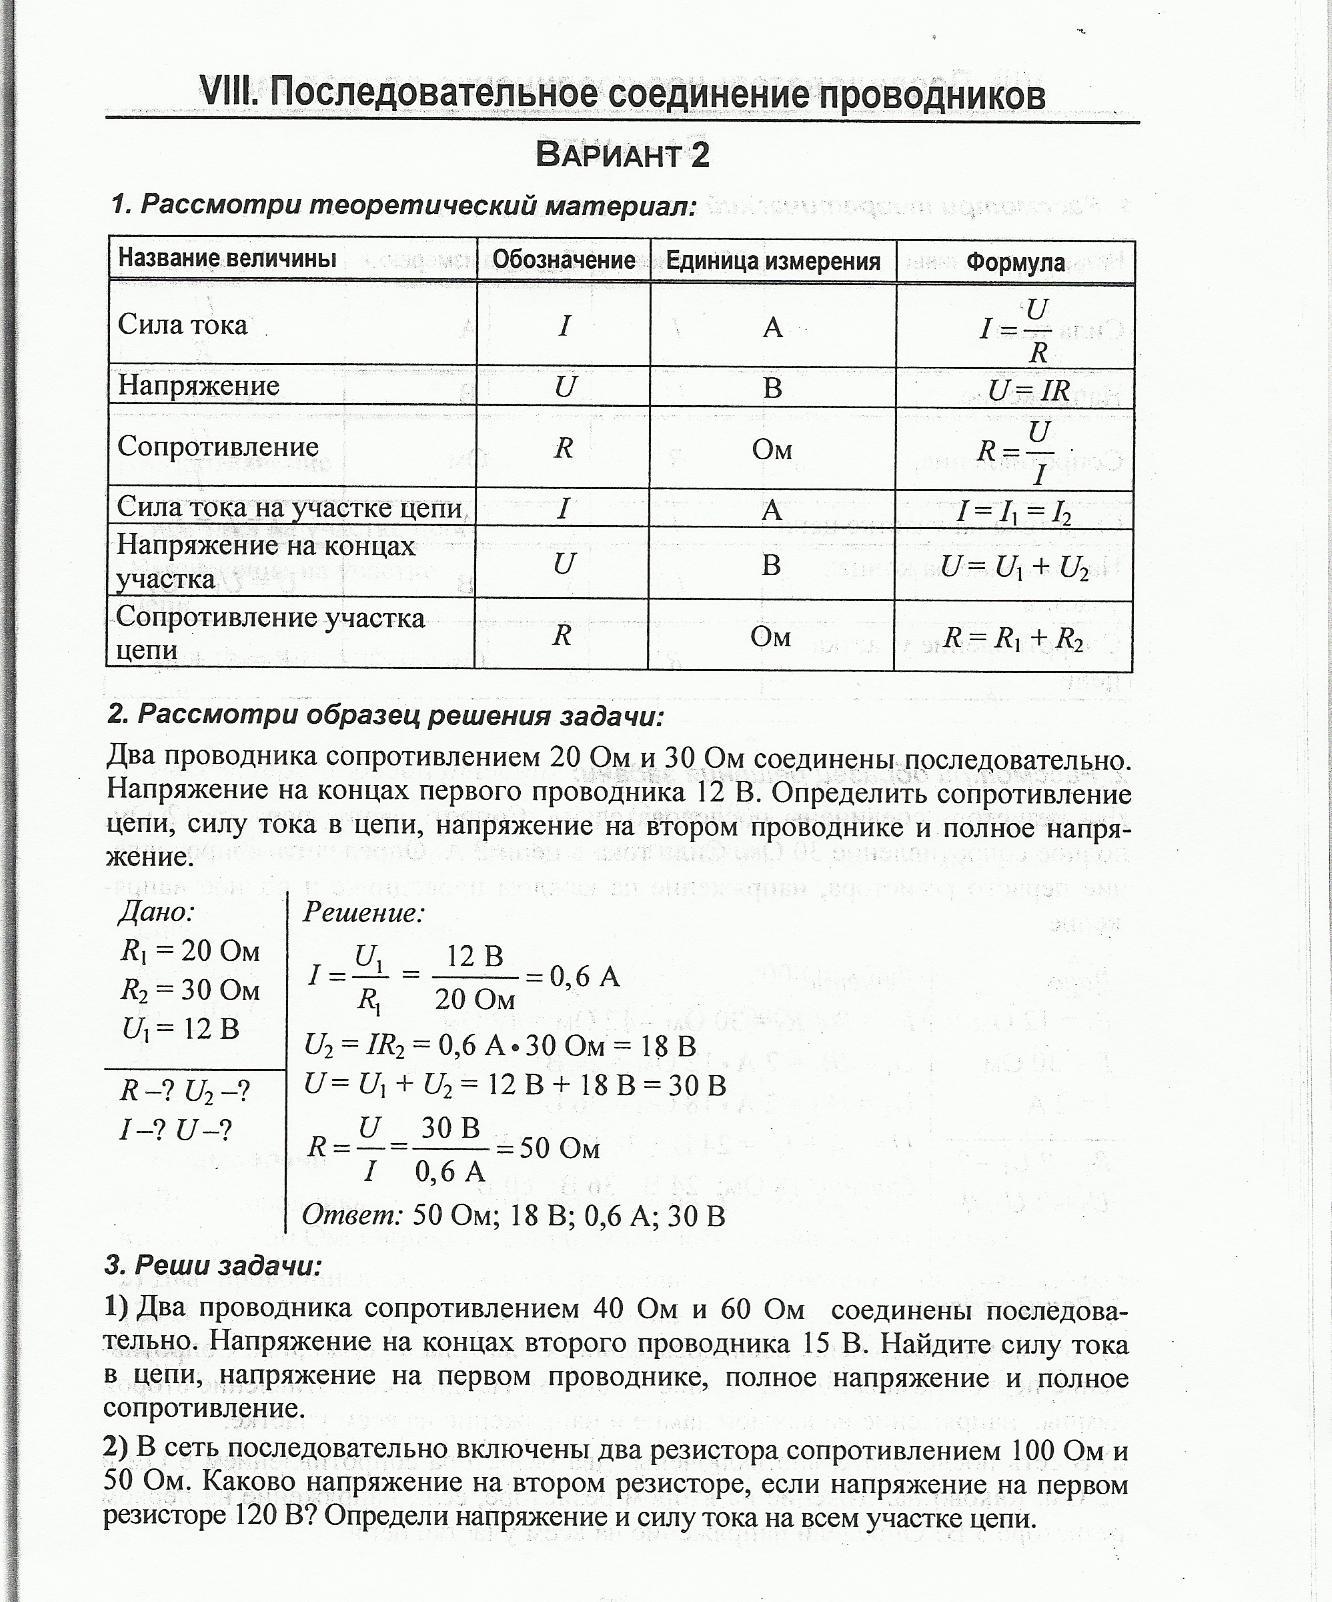 C:\Documents and Settings\руфина\Рабочий стол\сертиф2\Scanв2.jpg